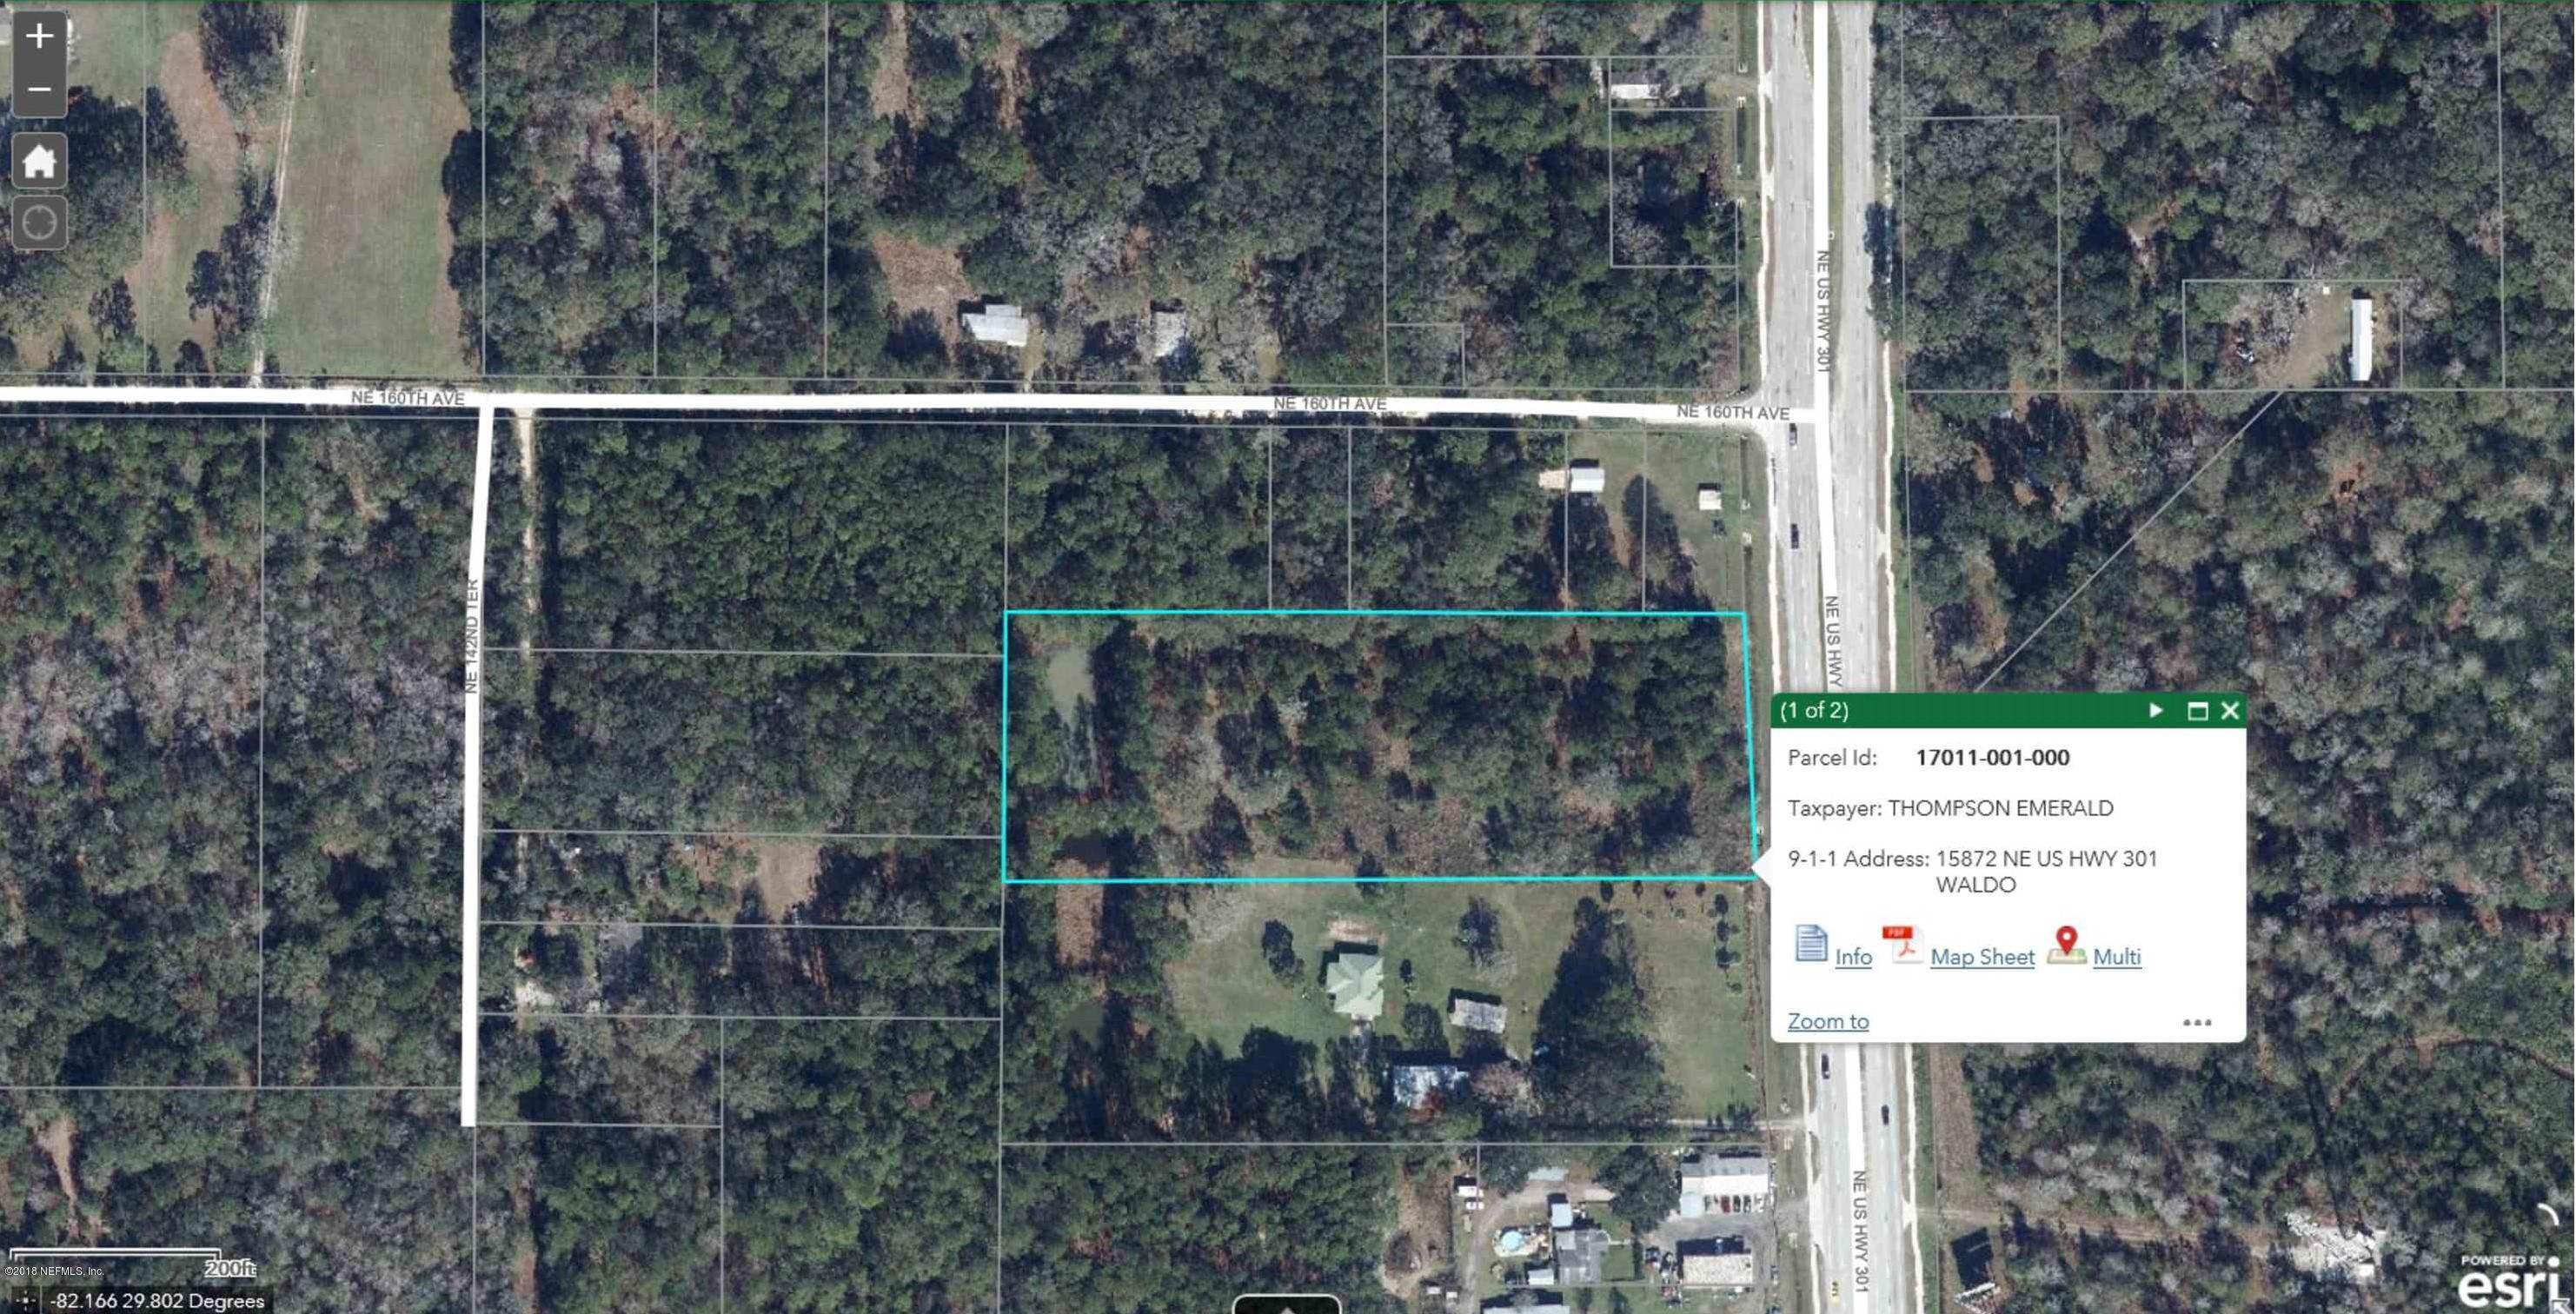 15872 US HIGHWAY 301, WALDO, FLORIDA 32694, ,Vacant land,For sale,US HIGHWAY 301,966197